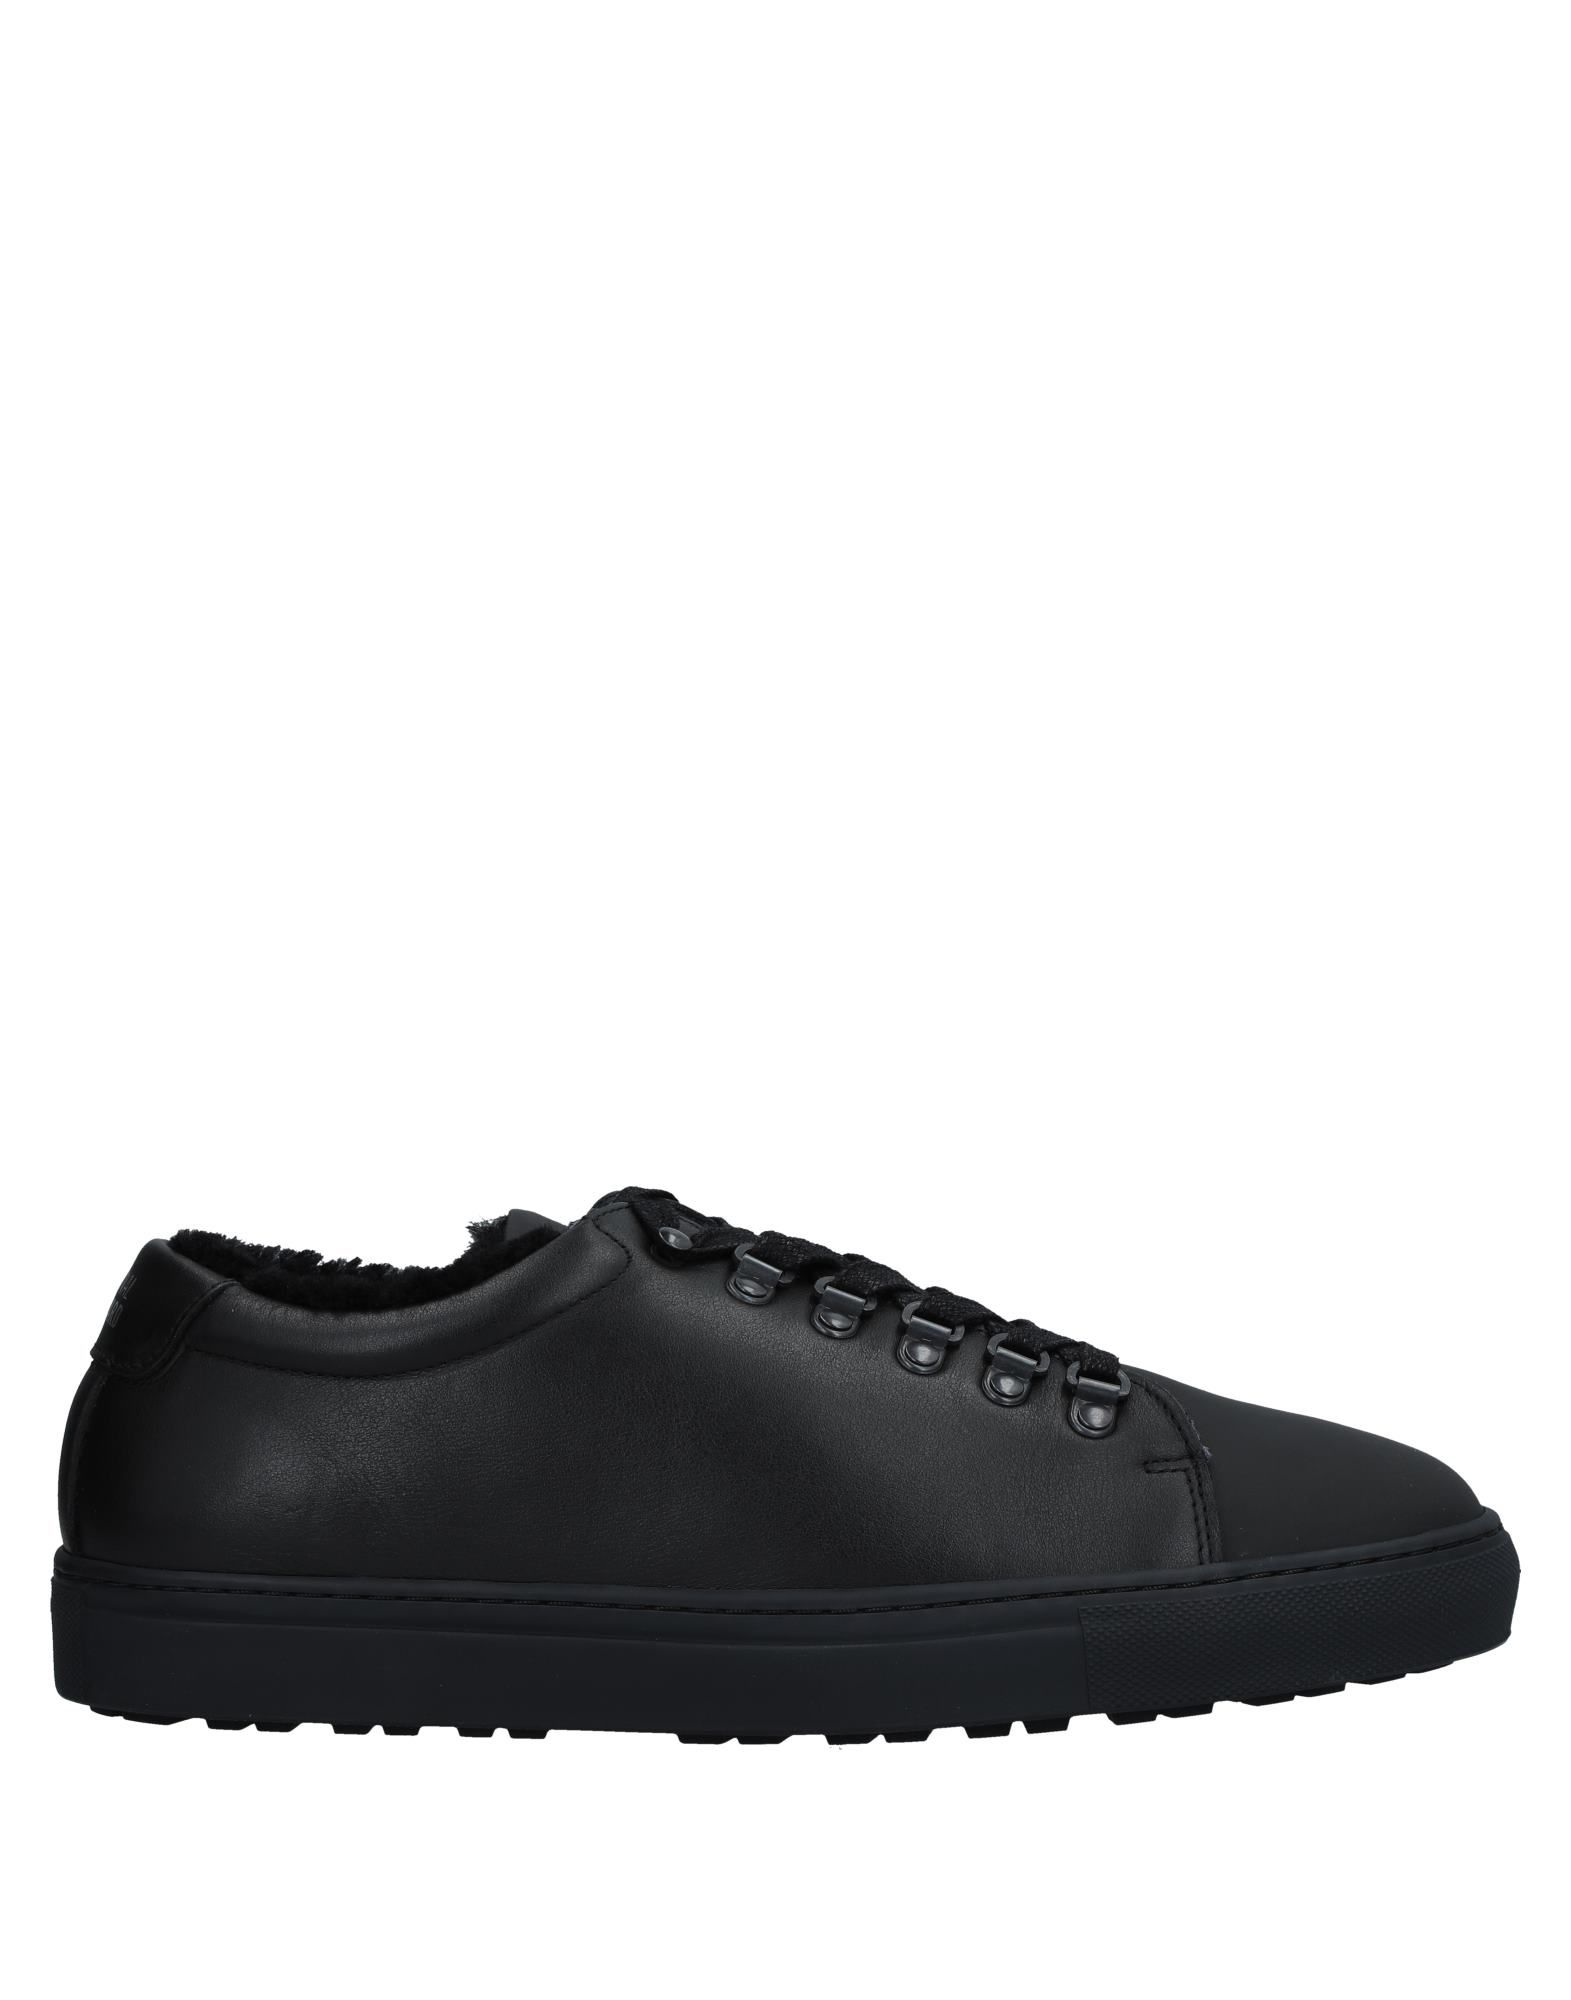 National Standard Sneakers Herren  11536749OK Gute Qualität beliebte Schuhe